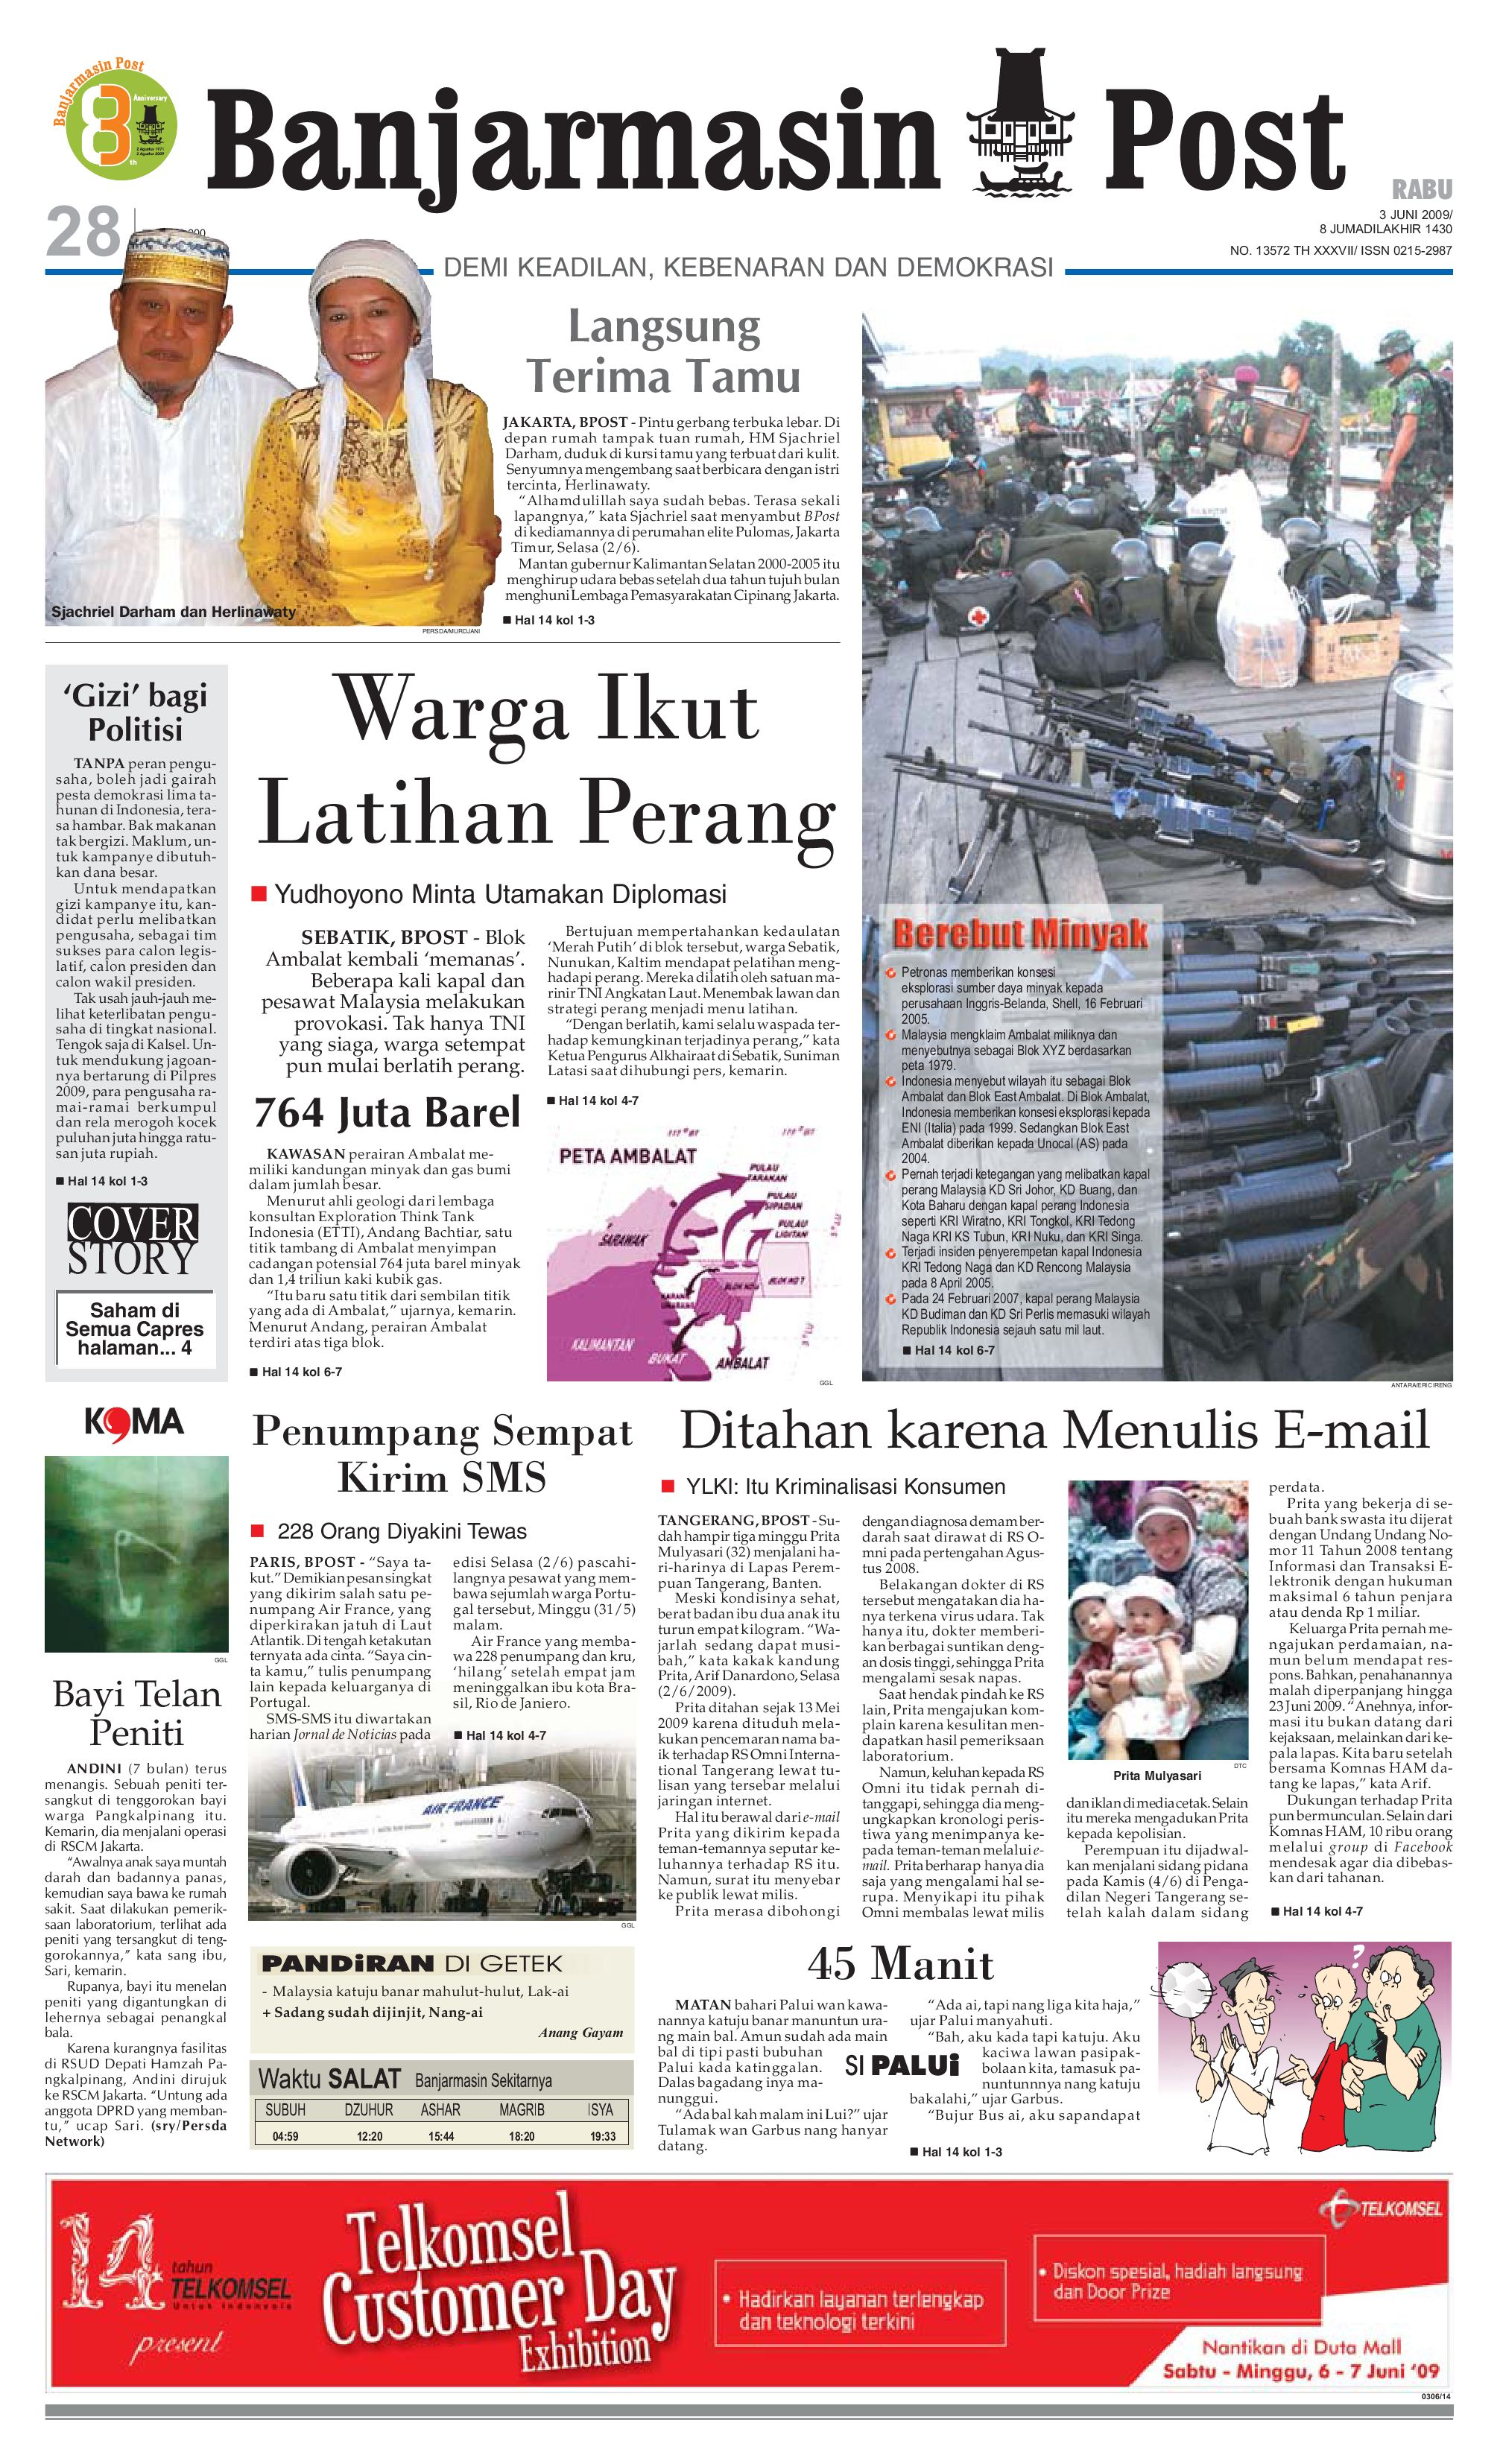 Banjarmasin Post Edisi Rabu 3 Juni 2009 By Issuu Tcash Vaganza 28 Vr Box Case Virtual Reality Glasses V 20